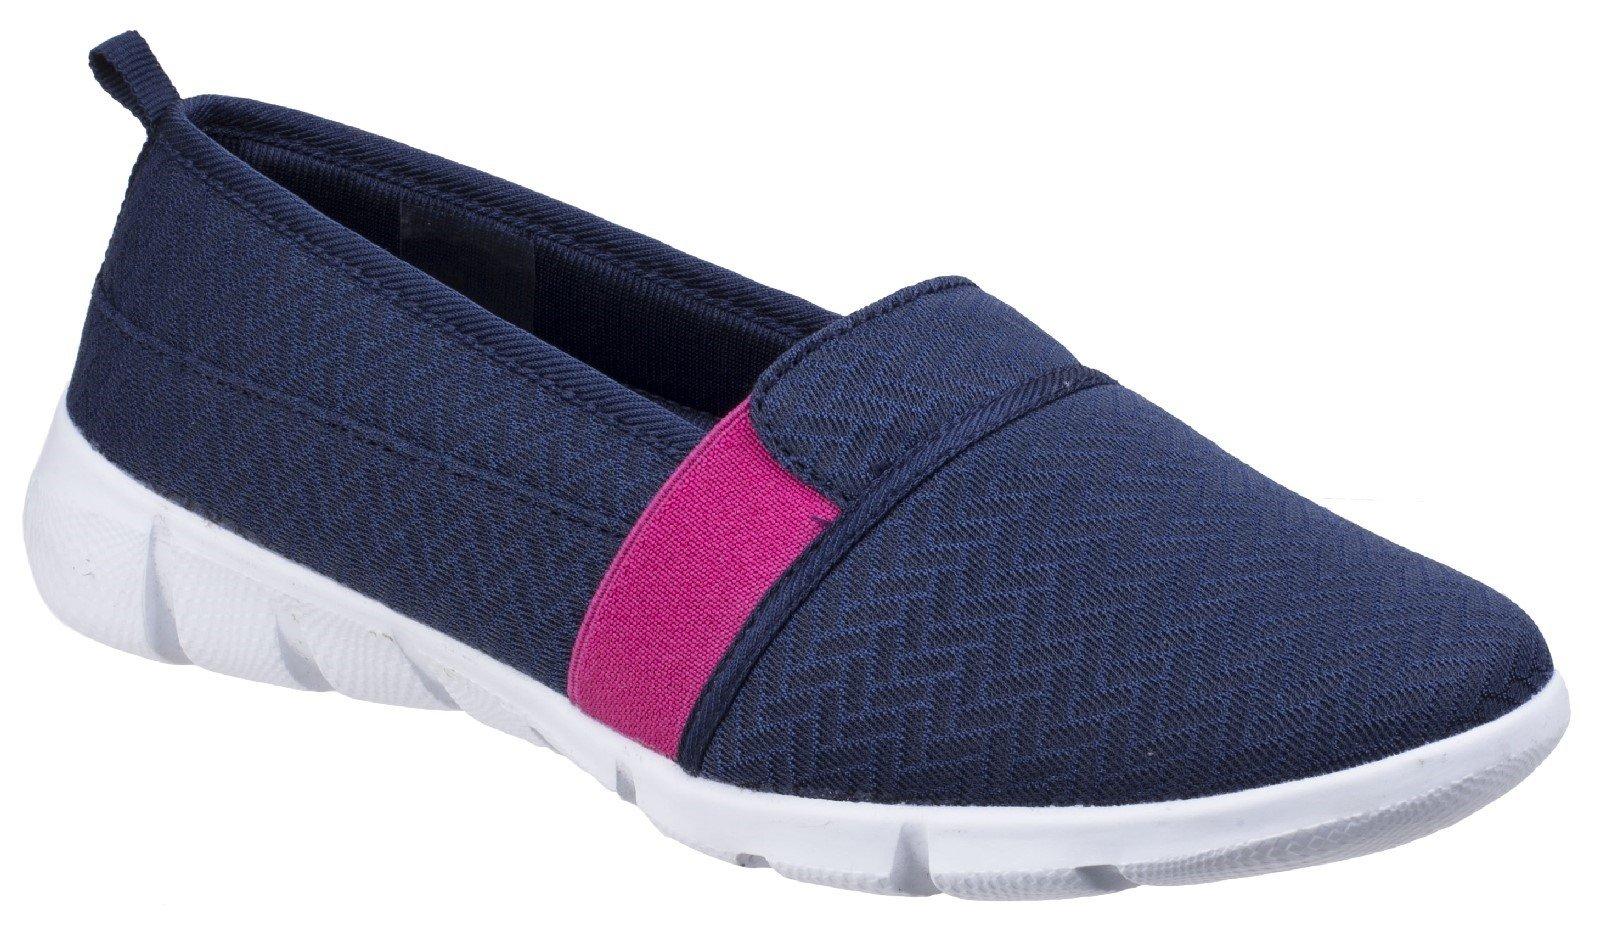 Fleet & Foster Women's Canary Espadrilles Shoe Various Colours 26310-43913 - Navy 3